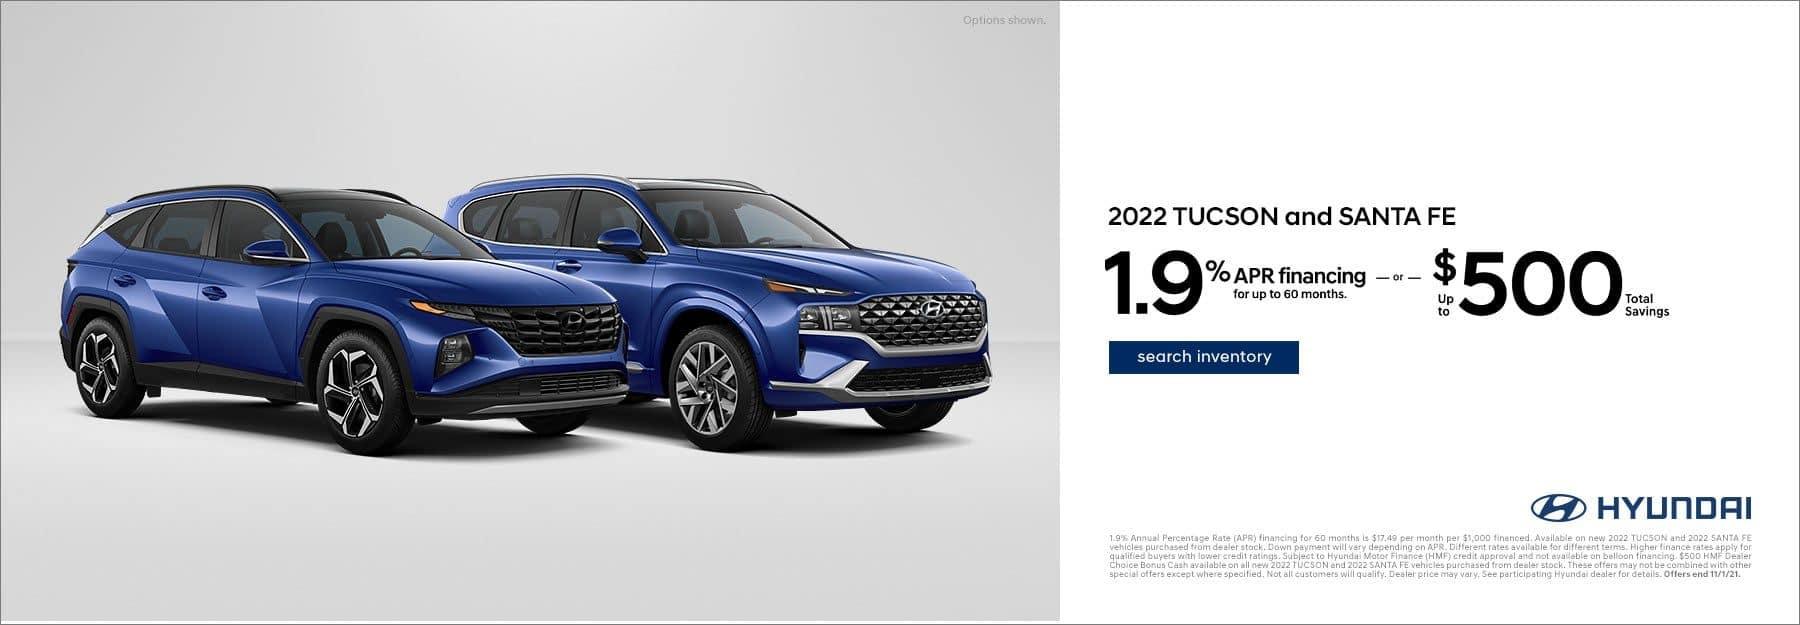 2022 Hyundai Tucson and Santa Fe APR offer